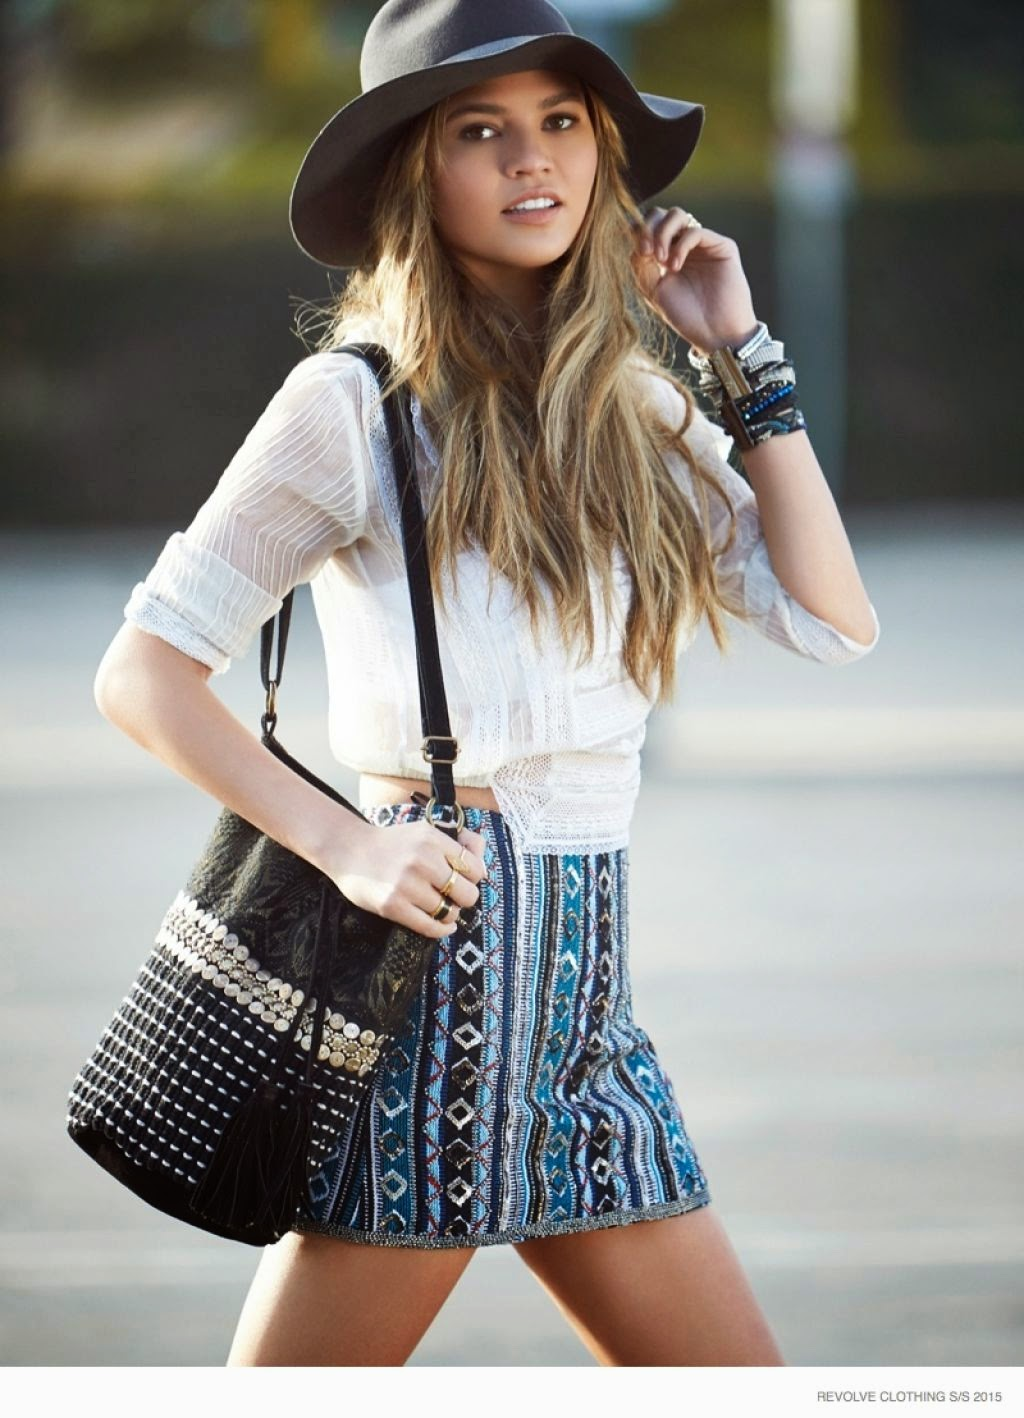 Chrissy Teigen poses for the Revolve Spring/Summer 2015 Lookbook